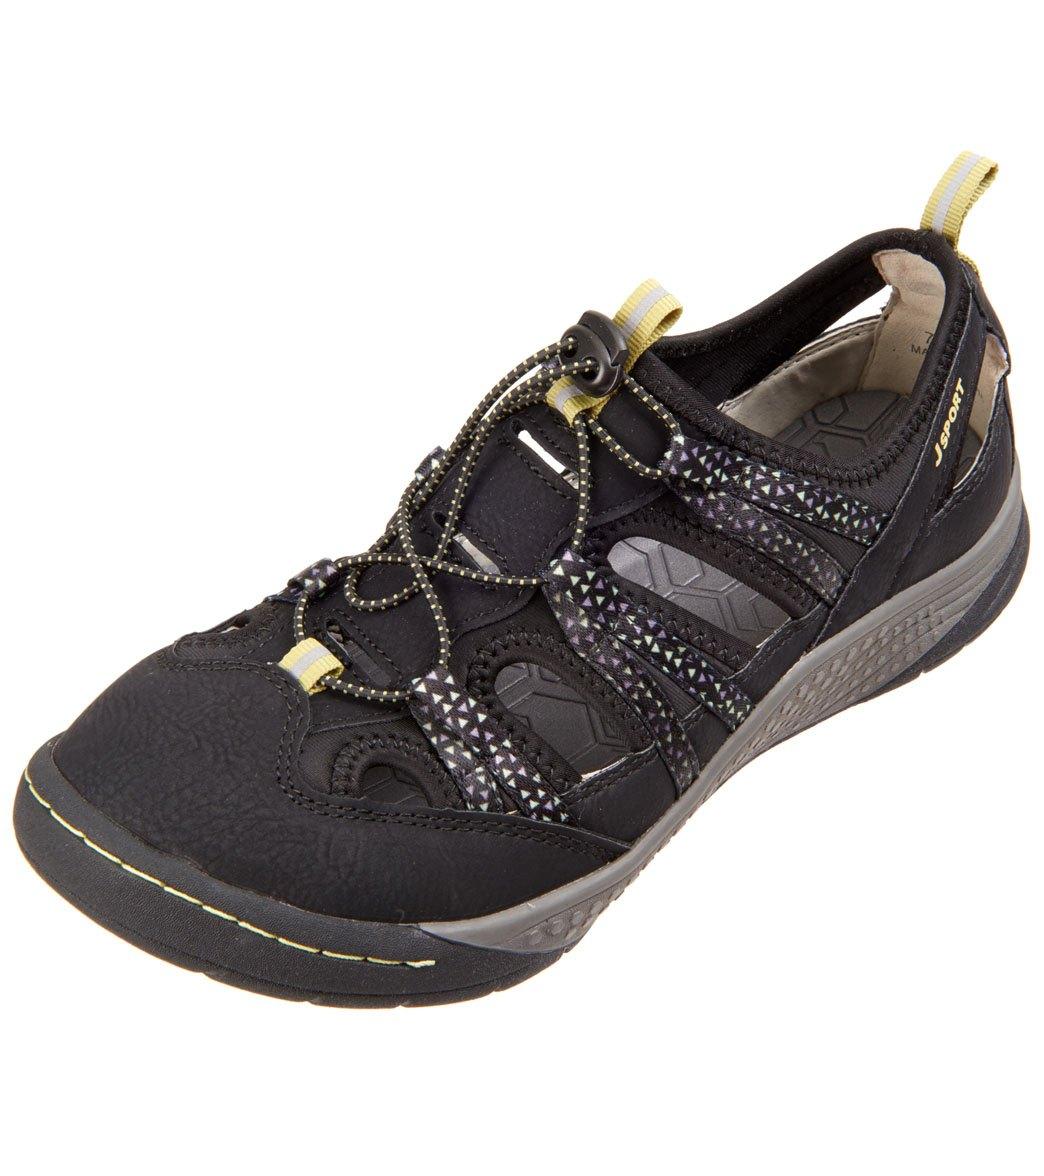 1b5e74bc0184 Jambu Women s Hibiscus Water Shoe at SwimOutlet.com - Free ...